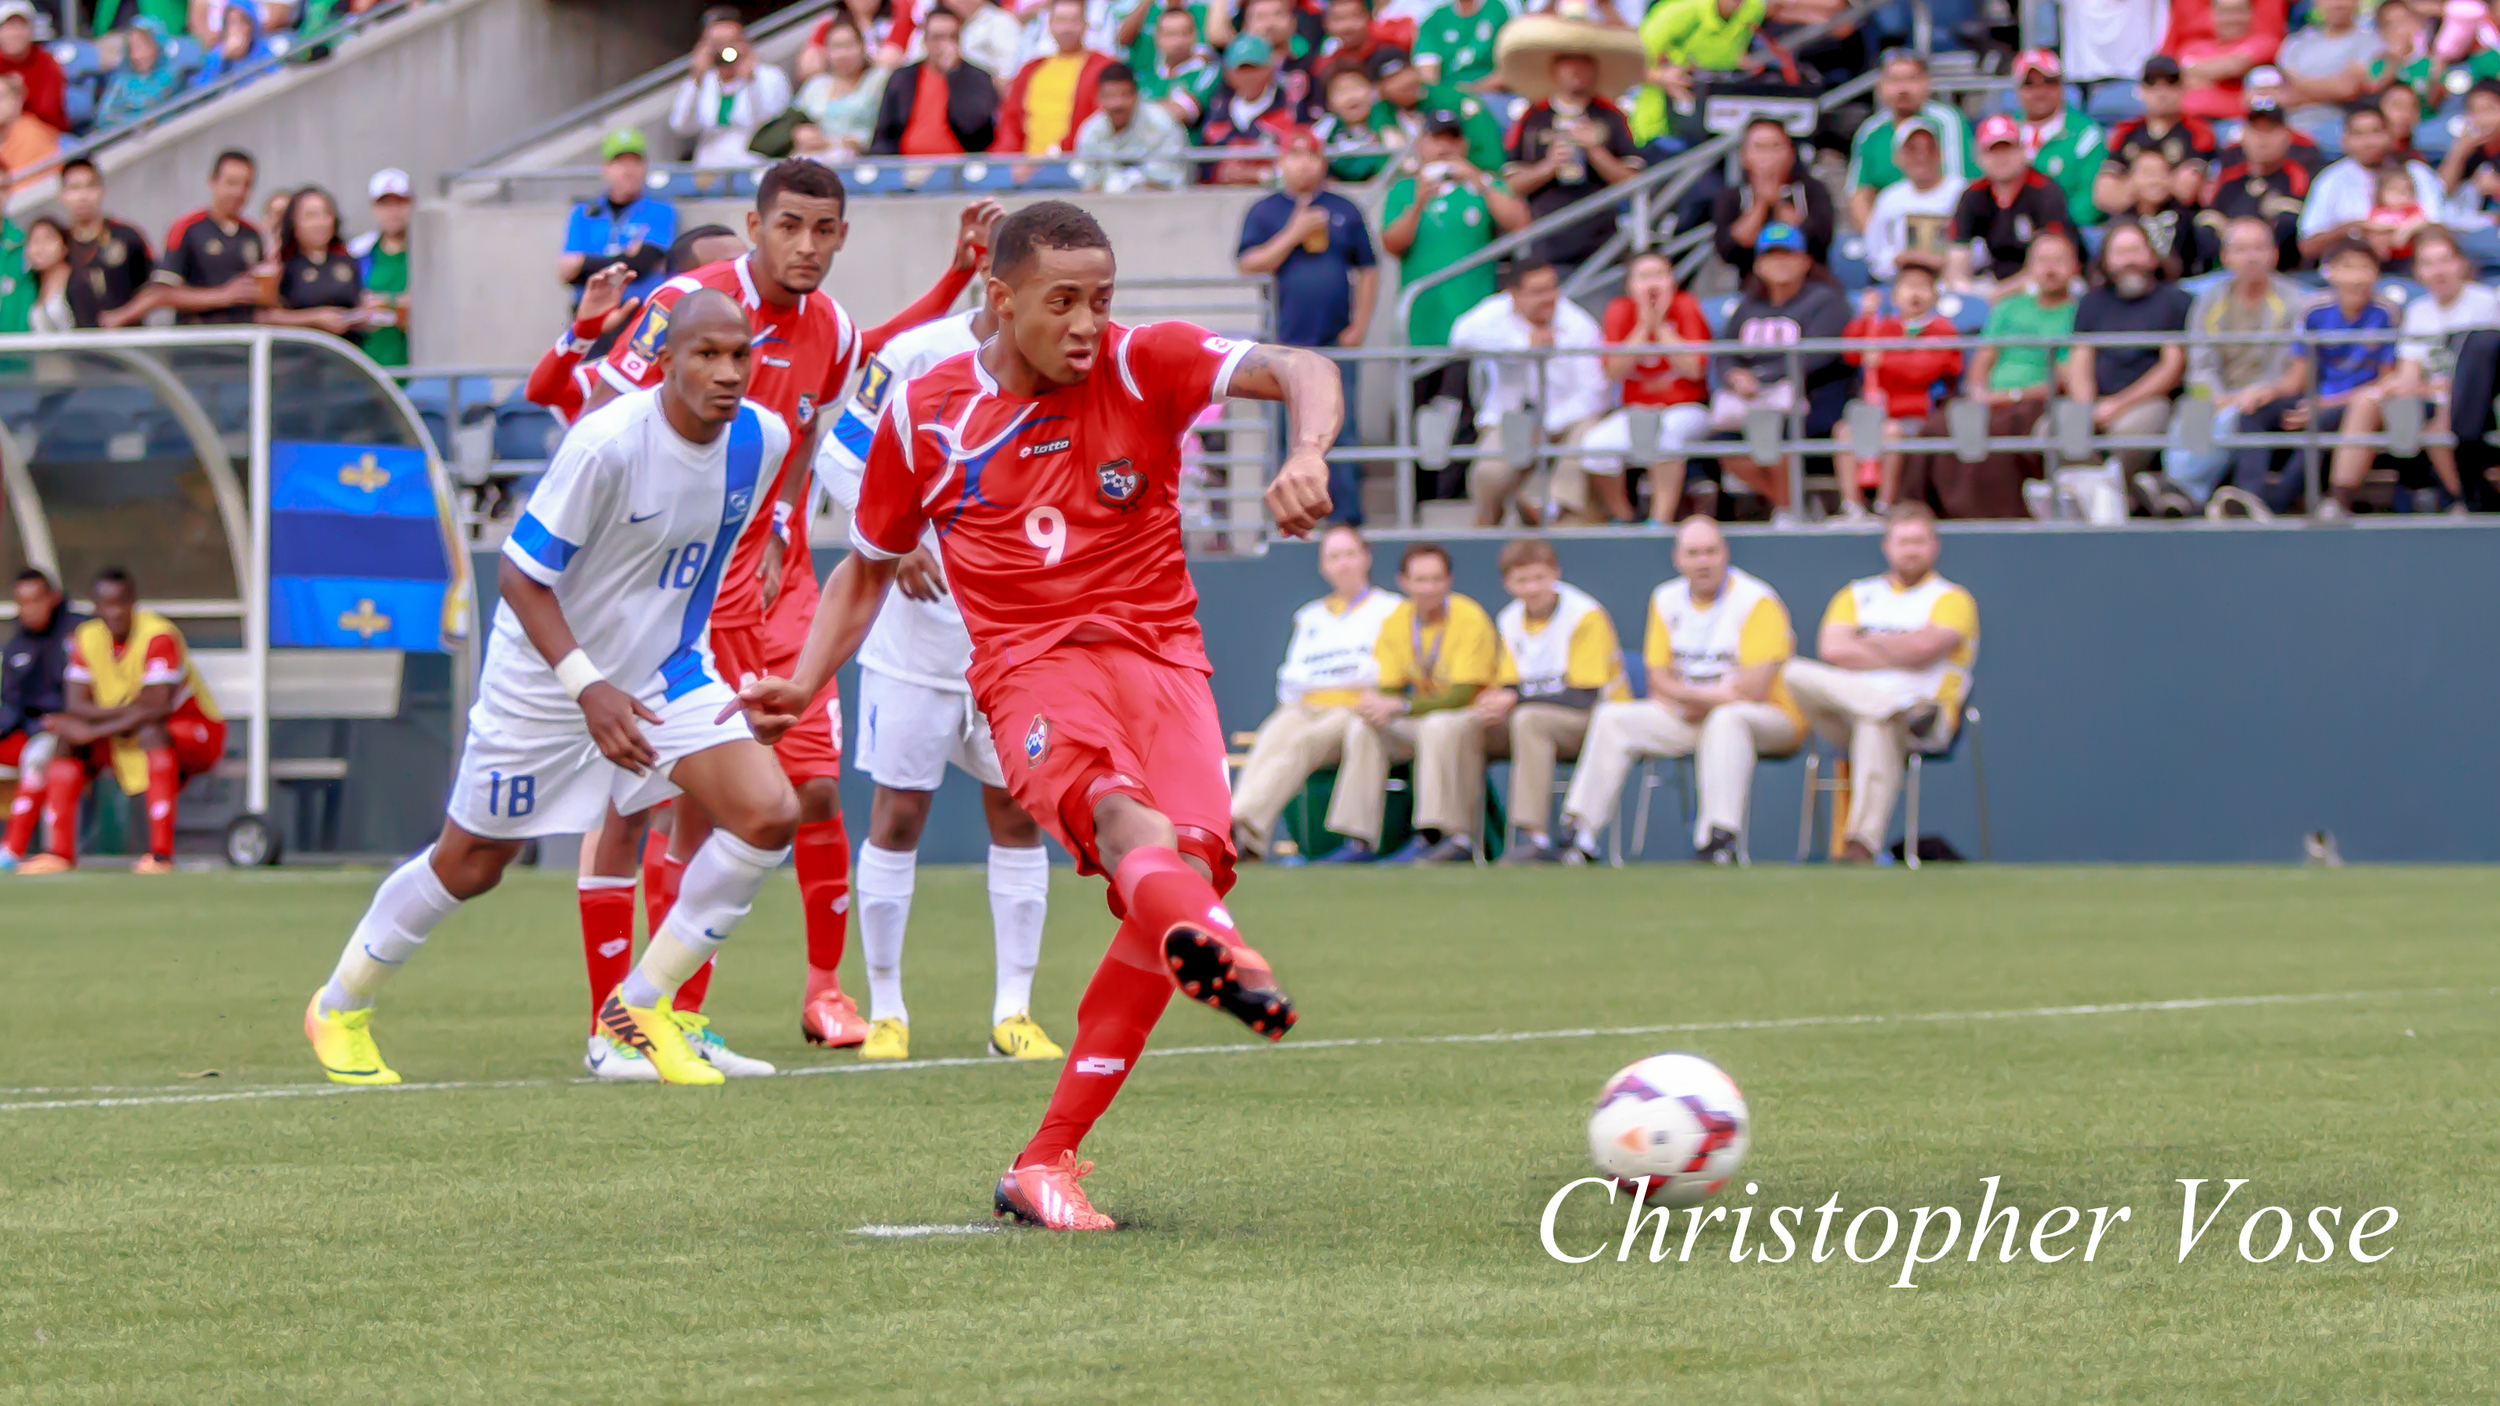 2013-07-11 Gabriel Torres Goal (Penalty Kick).jpg